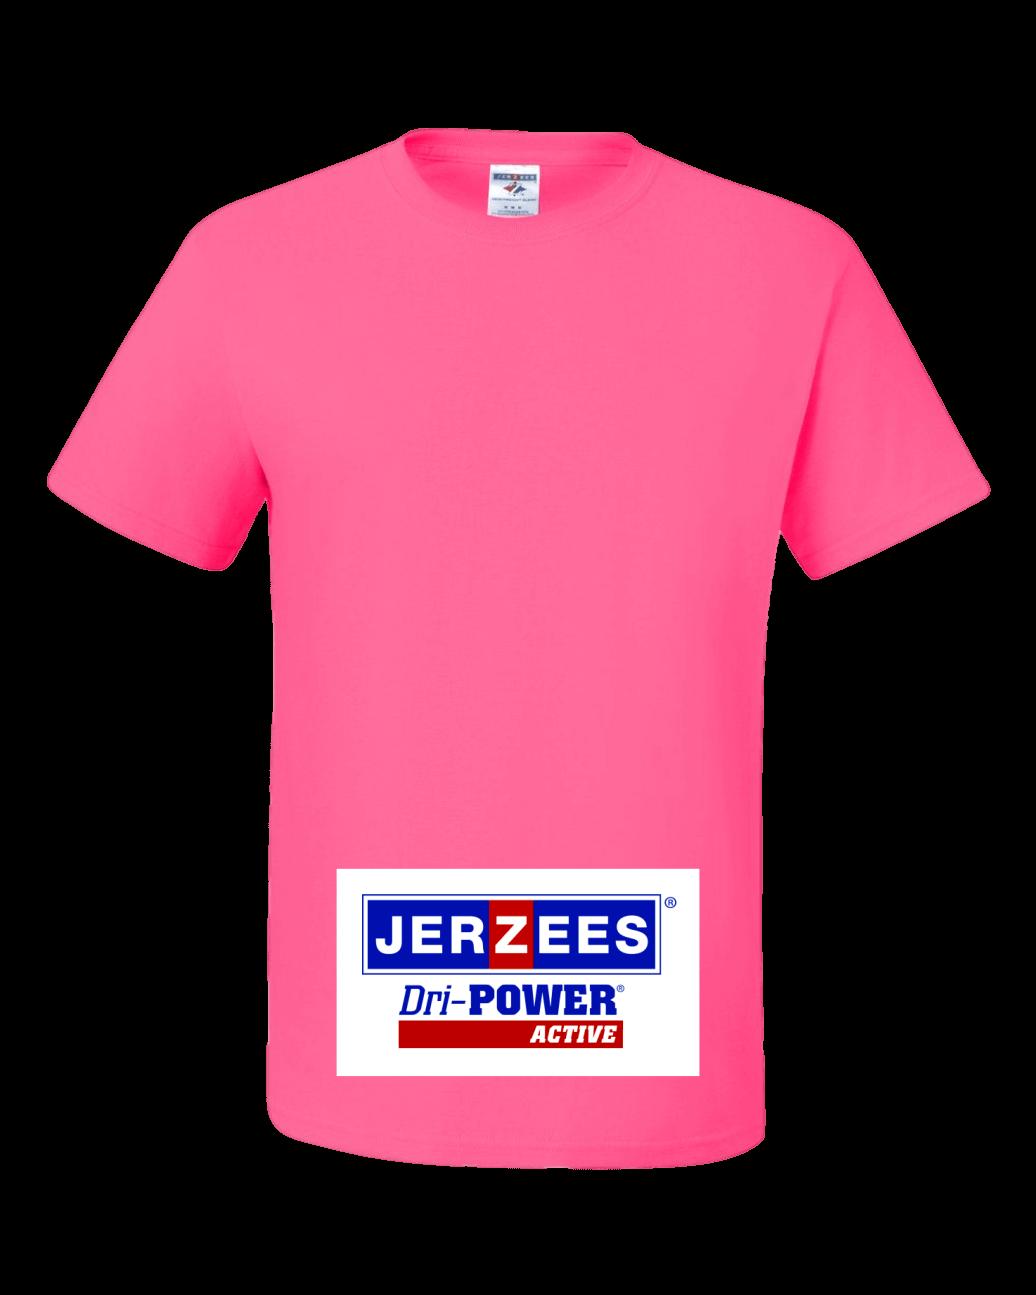 Jerzees Dri Power Cheap T Shirt Printing Cheap Tees Screen Printing